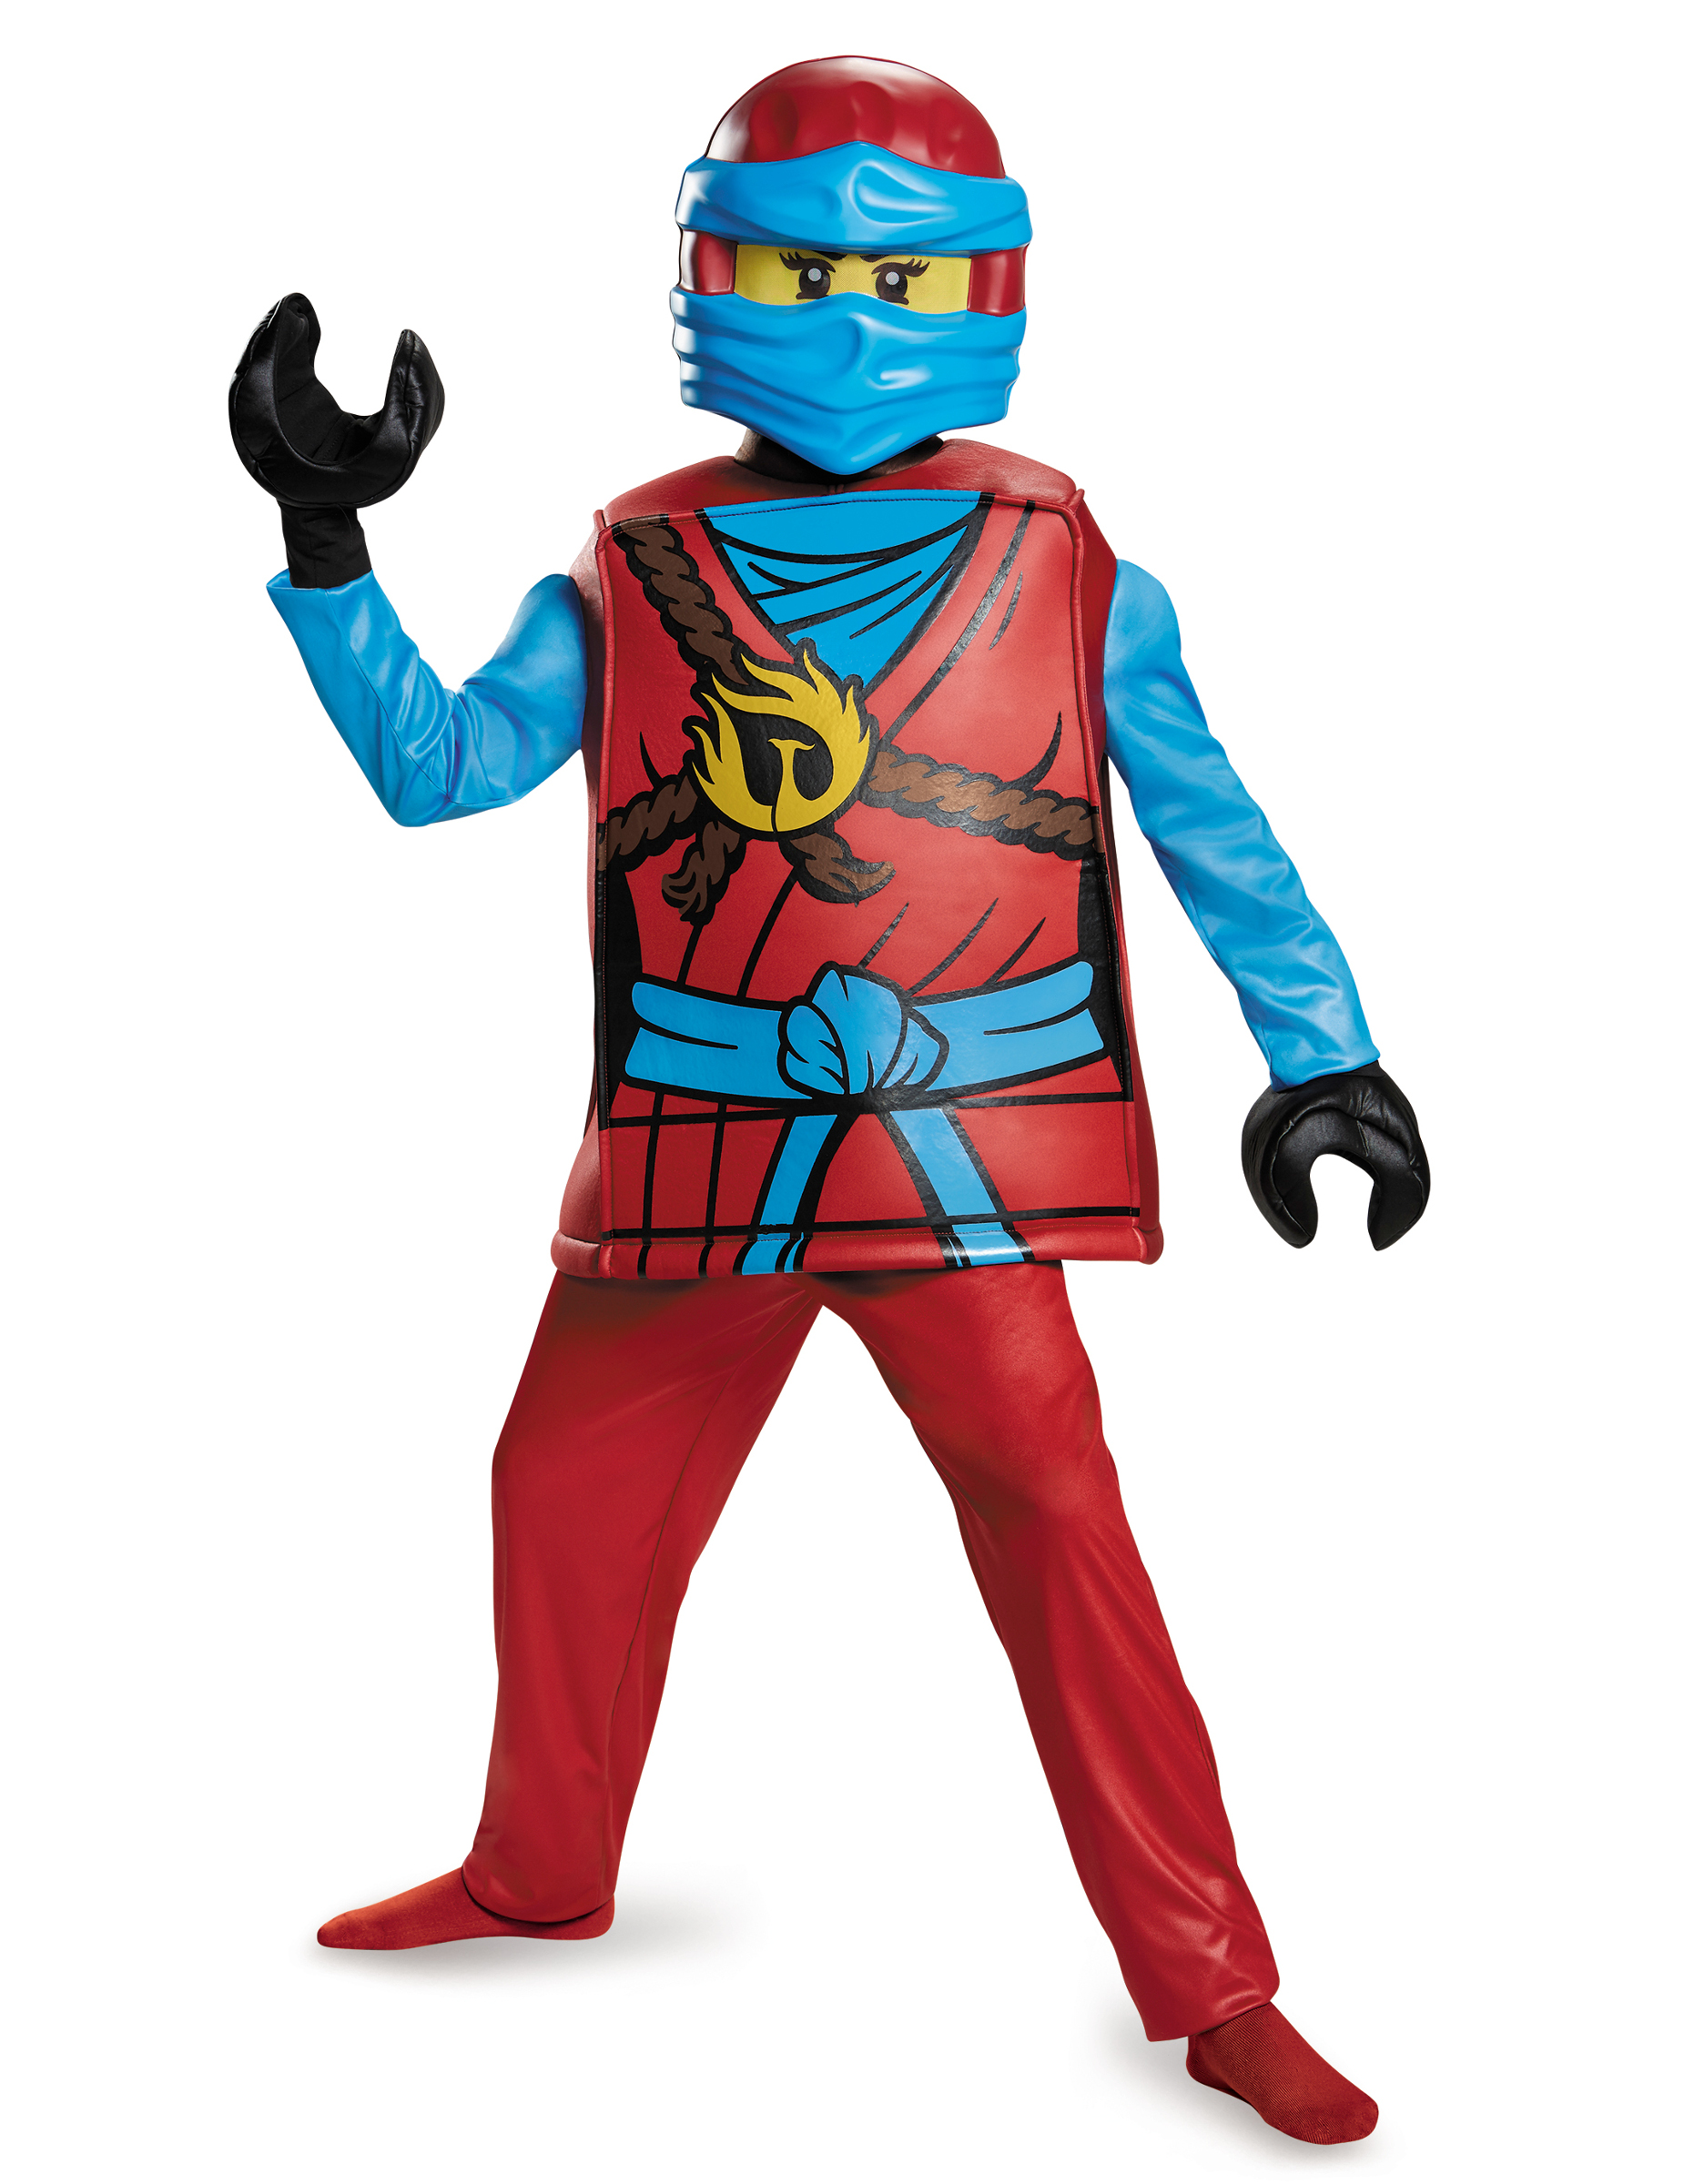 Lego Nya Ninjago Kinderkostum Ninja Rot Gelb Blau Gunstige